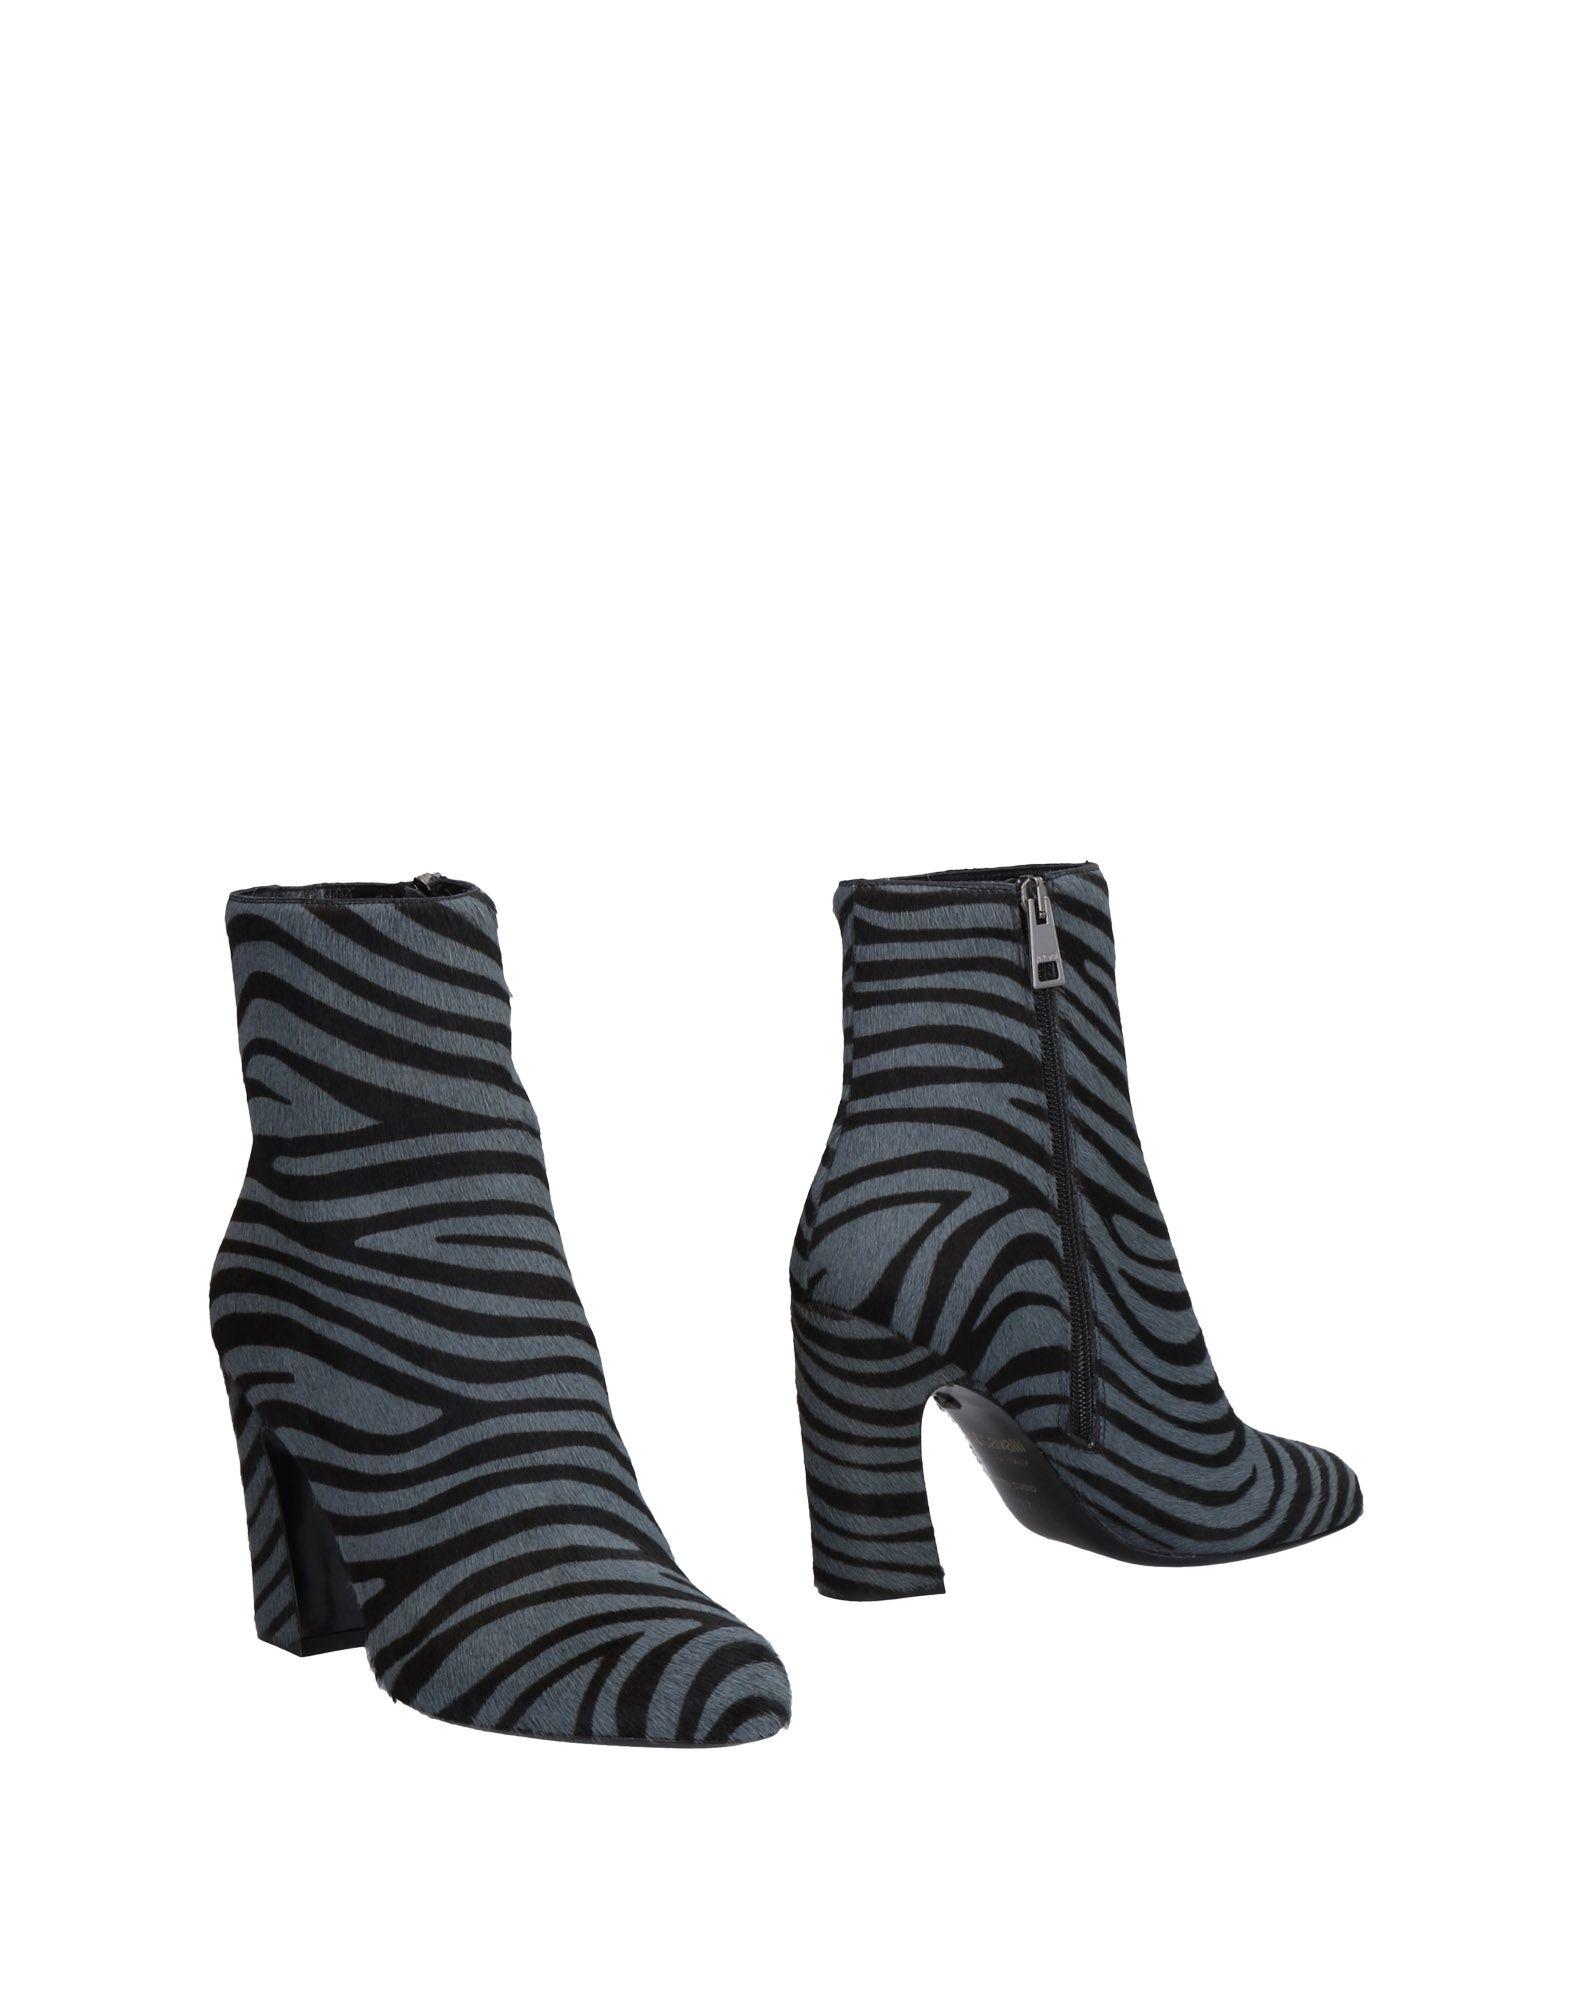 Rabatt Schuhe Schuhe Rabatt Just Cavalli Stiefelette Damen  11469569LN e40330